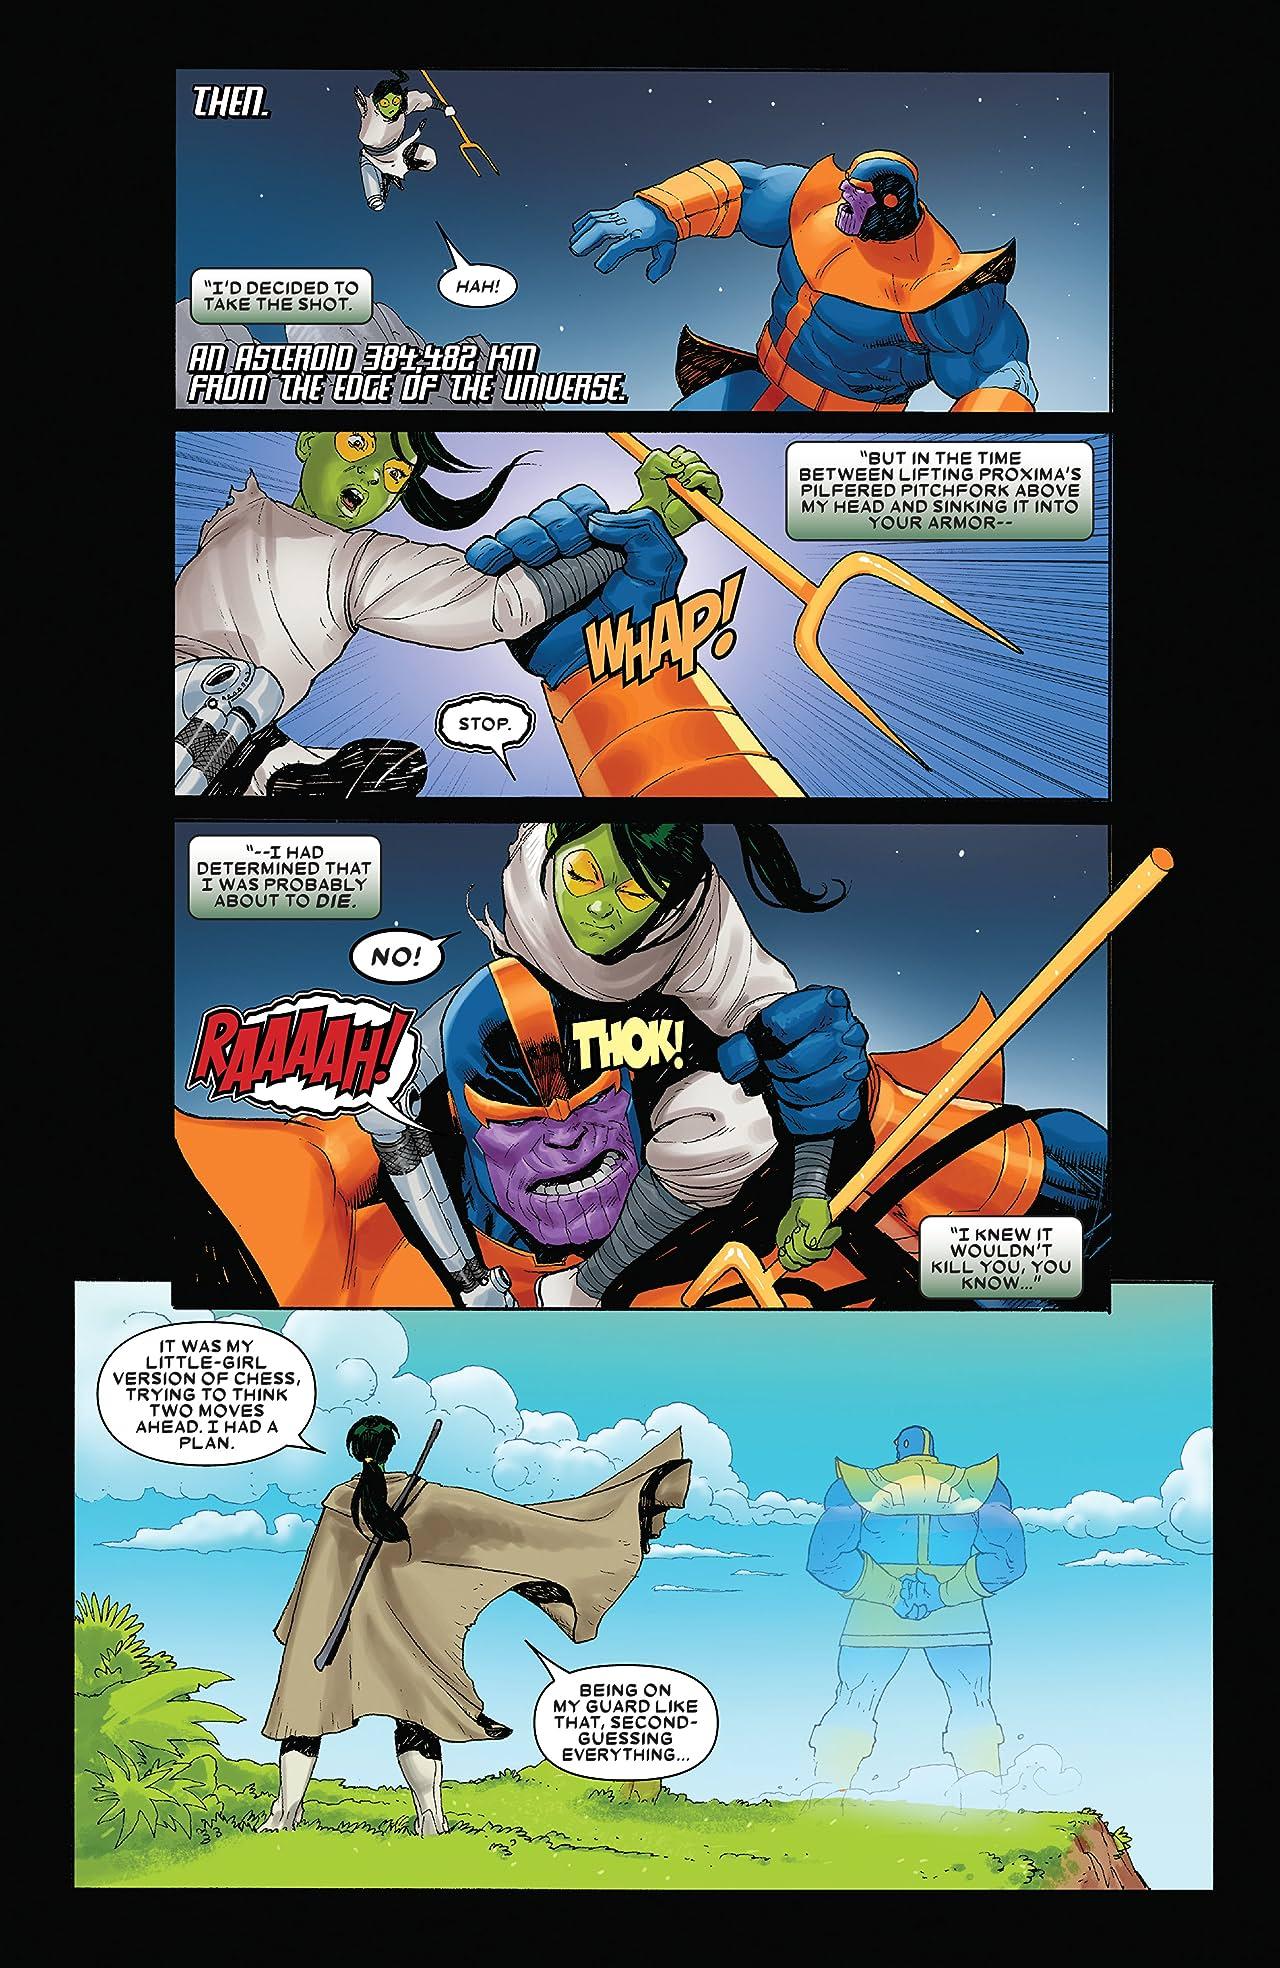 Thanos (2019) #6 (of 6)